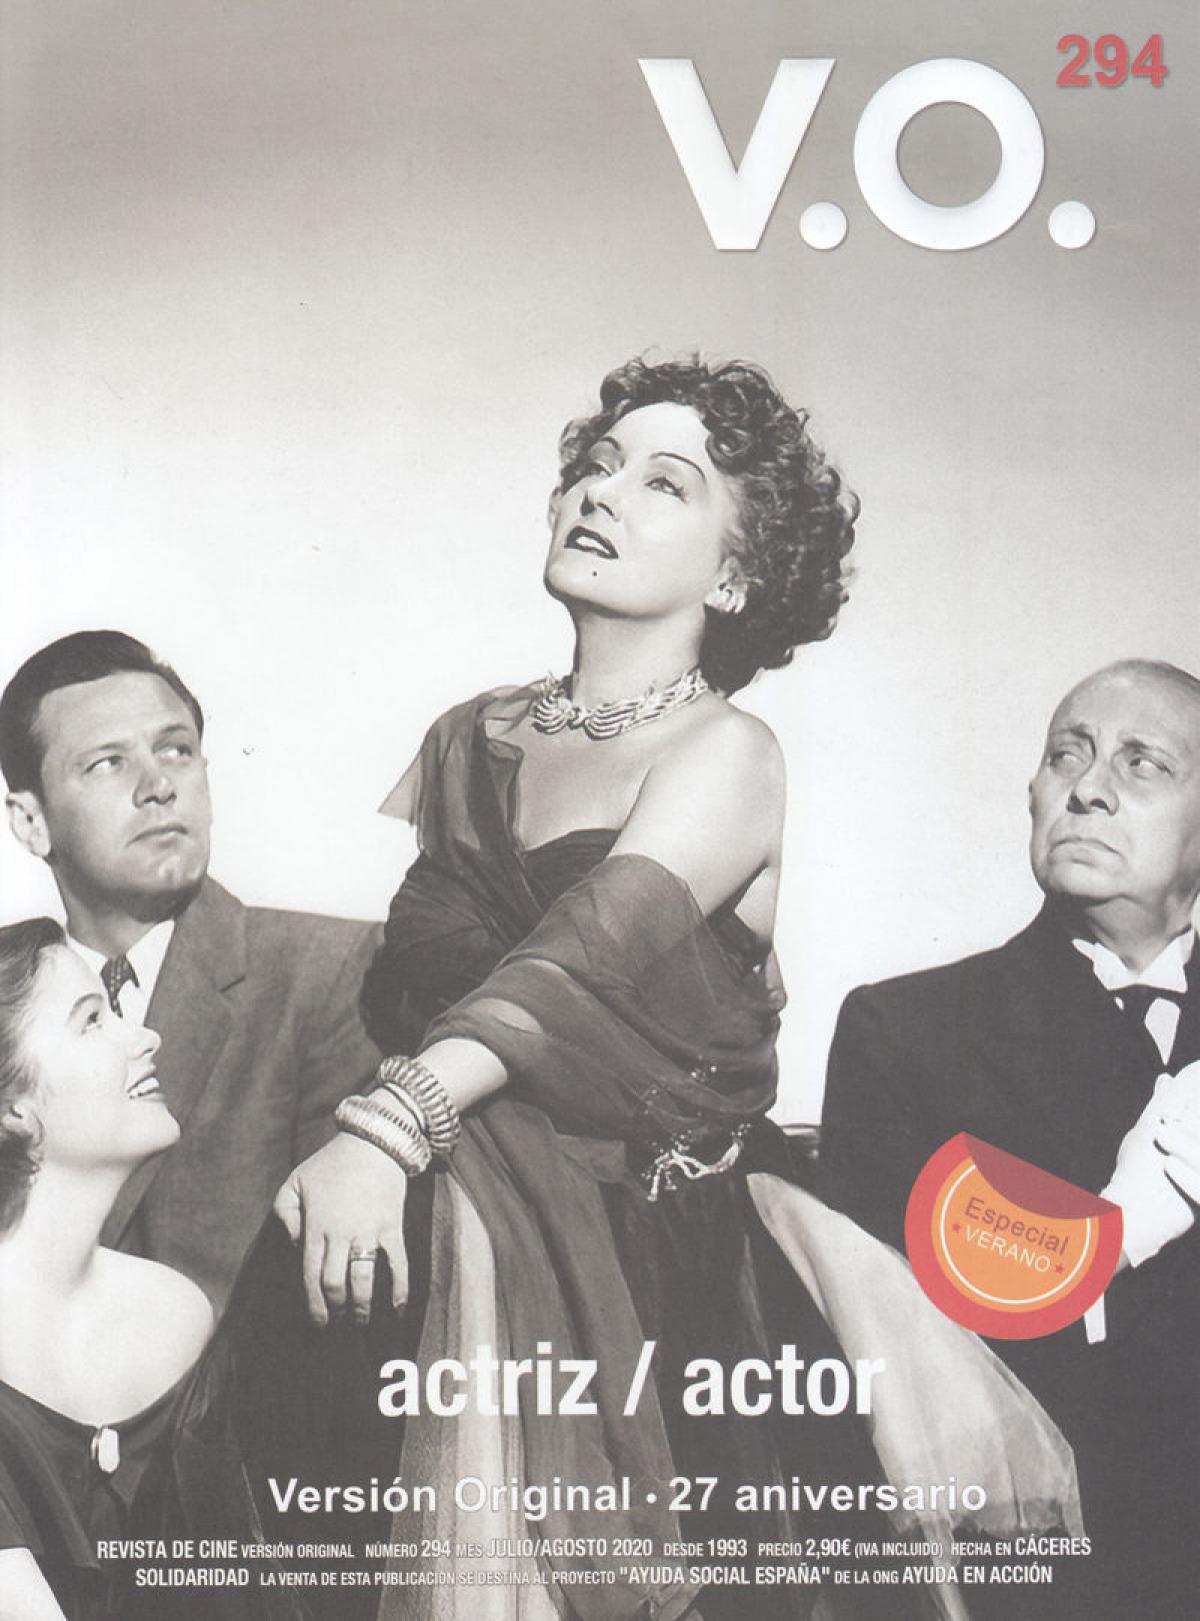 Actriz/actor